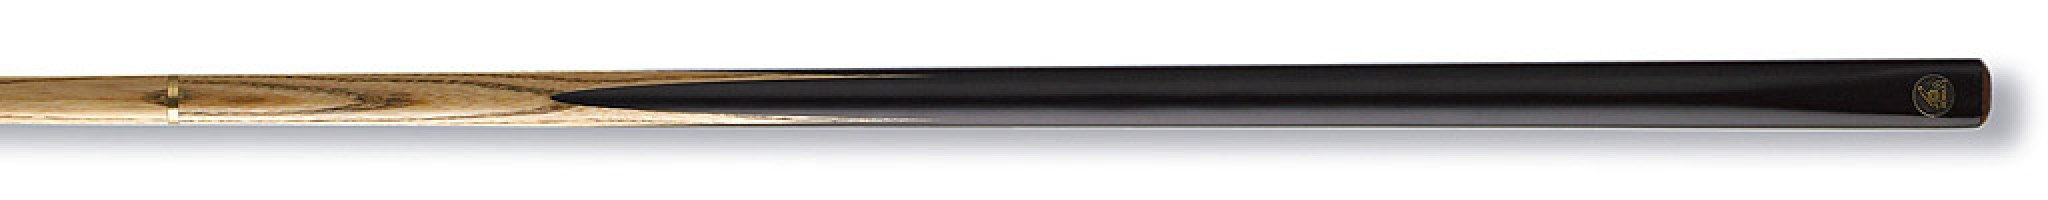 Peradon Cannon T 4dff8679721b0 0x200